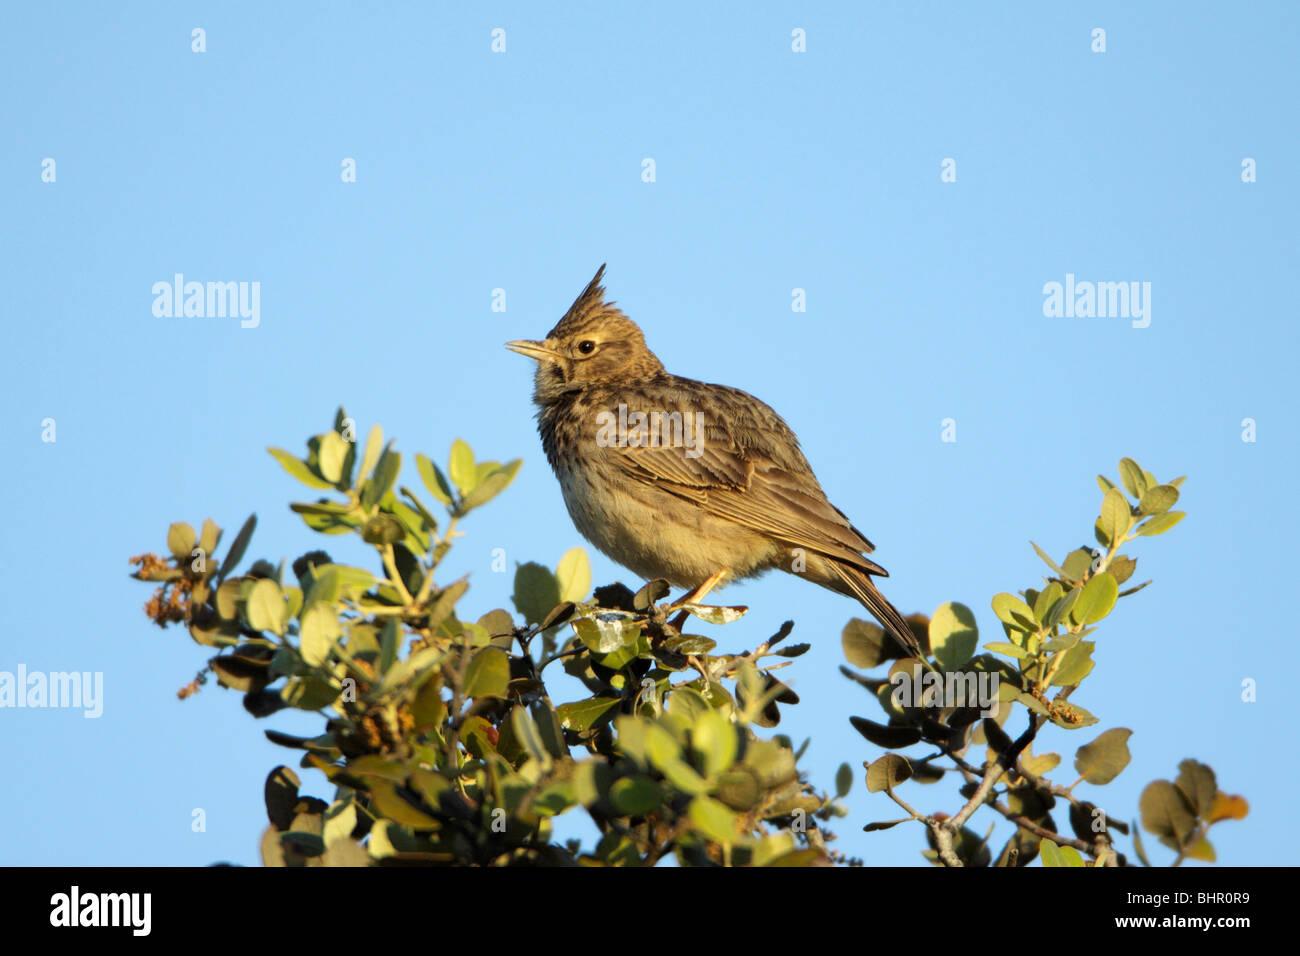 Crested Lark (Galerida cristata), perched on Holm Oak, singing, Portugal Stock Photo